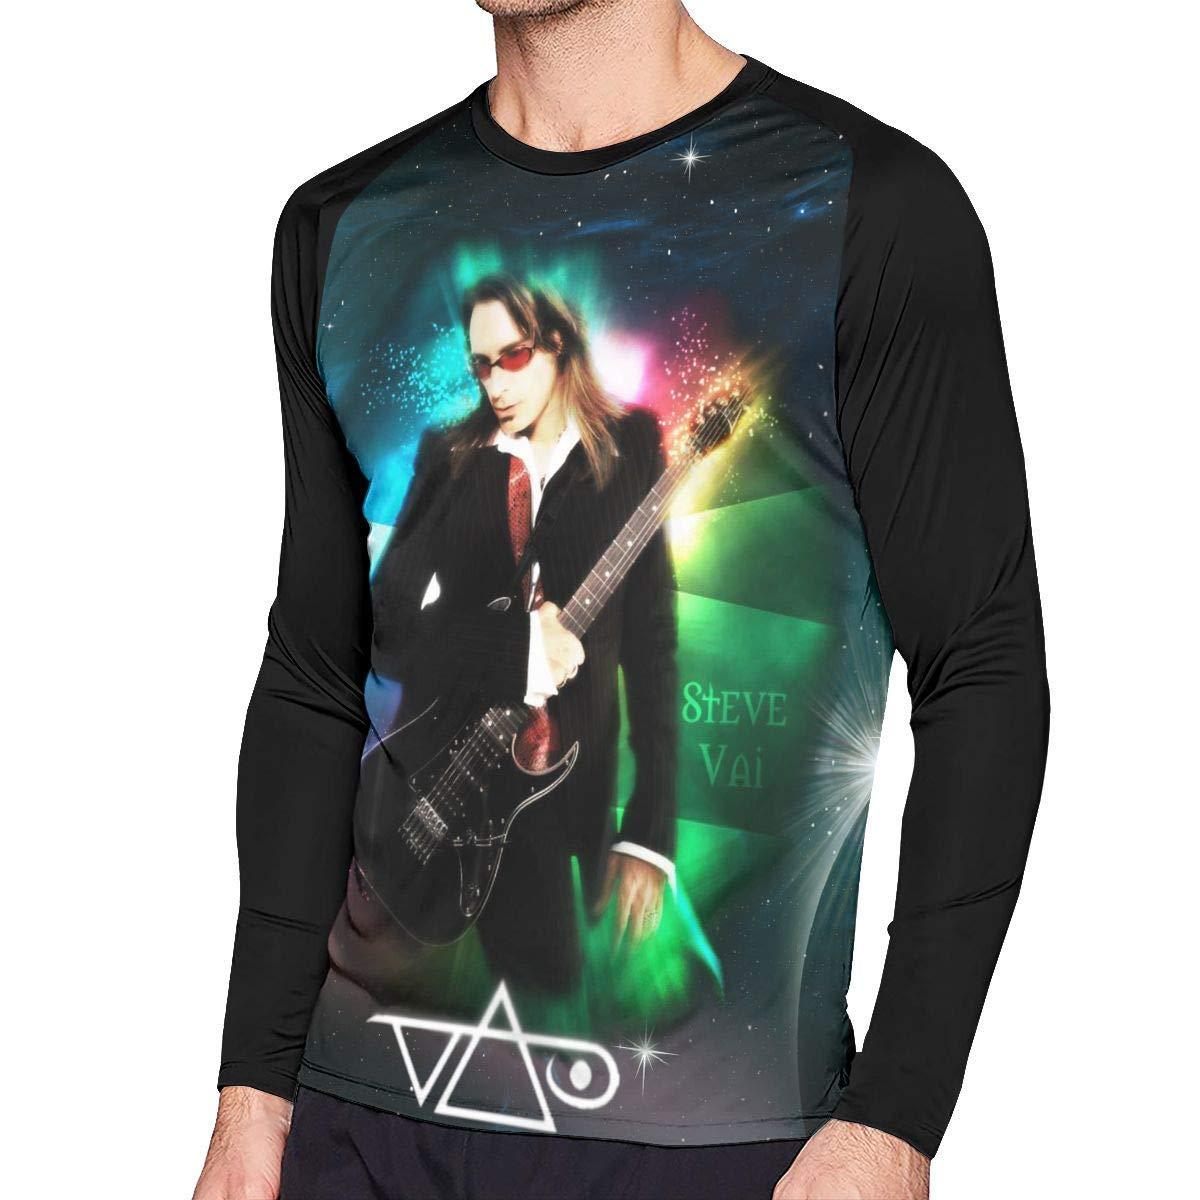 LIBERVIV Steve Vai Mens Long Sleeve Baseball Tee Shirt Sports Raglan Tee Shirts